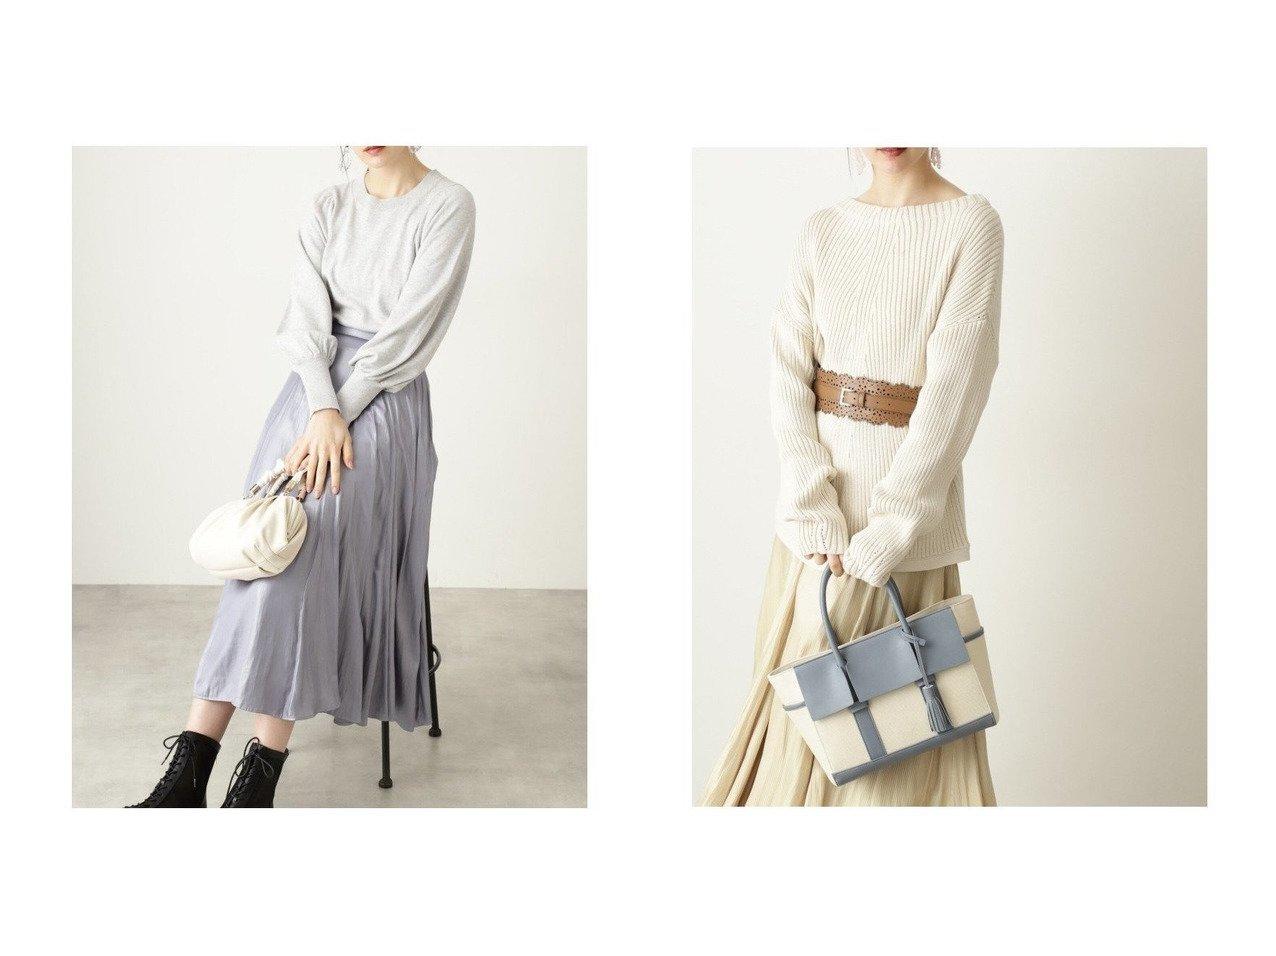 【JILLSTUART/ジルスチュアート】のイザベルスカート&マルセラニット JILLSTUARTのおすすめ!人気、トレンド・レディースファッションの通販  おすすめで人気の流行・トレンド、ファッションの通販商品 メンズファッション・キッズファッション・インテリア・家具・レディースファッション・服の通販 founy(ファニー) https://founy.com/ ファッション Fashion レディースファッション WOMEN スカート Skirt トップス Tops Tshirt ニット Knit Tops NEW・新作・新着・新入荷 New Arrivals サテン スニーカー シンプル スタンダード 再入荷 Restock/Back in Stock/Re Arrival |ID:crp329100000017810